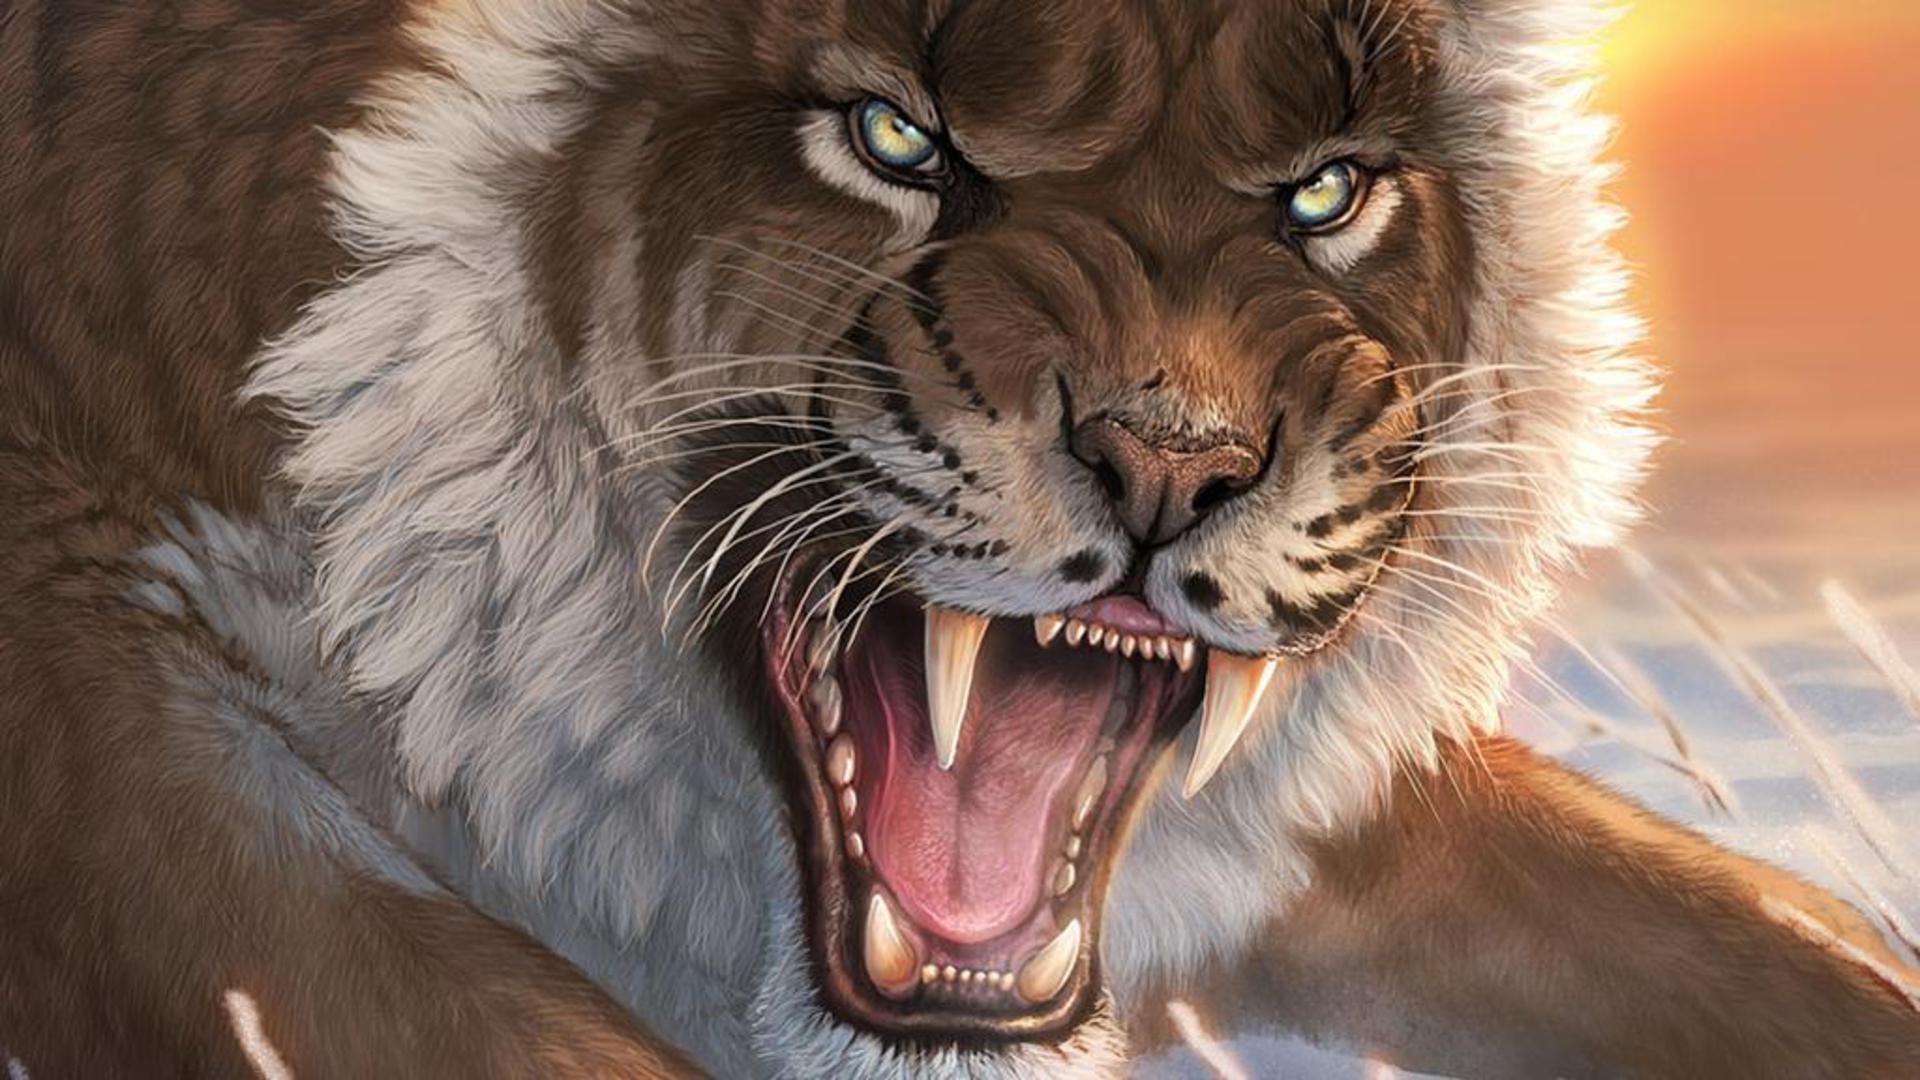 Saber Tooth Tiger Wallpapers Wallpaper Cave (с